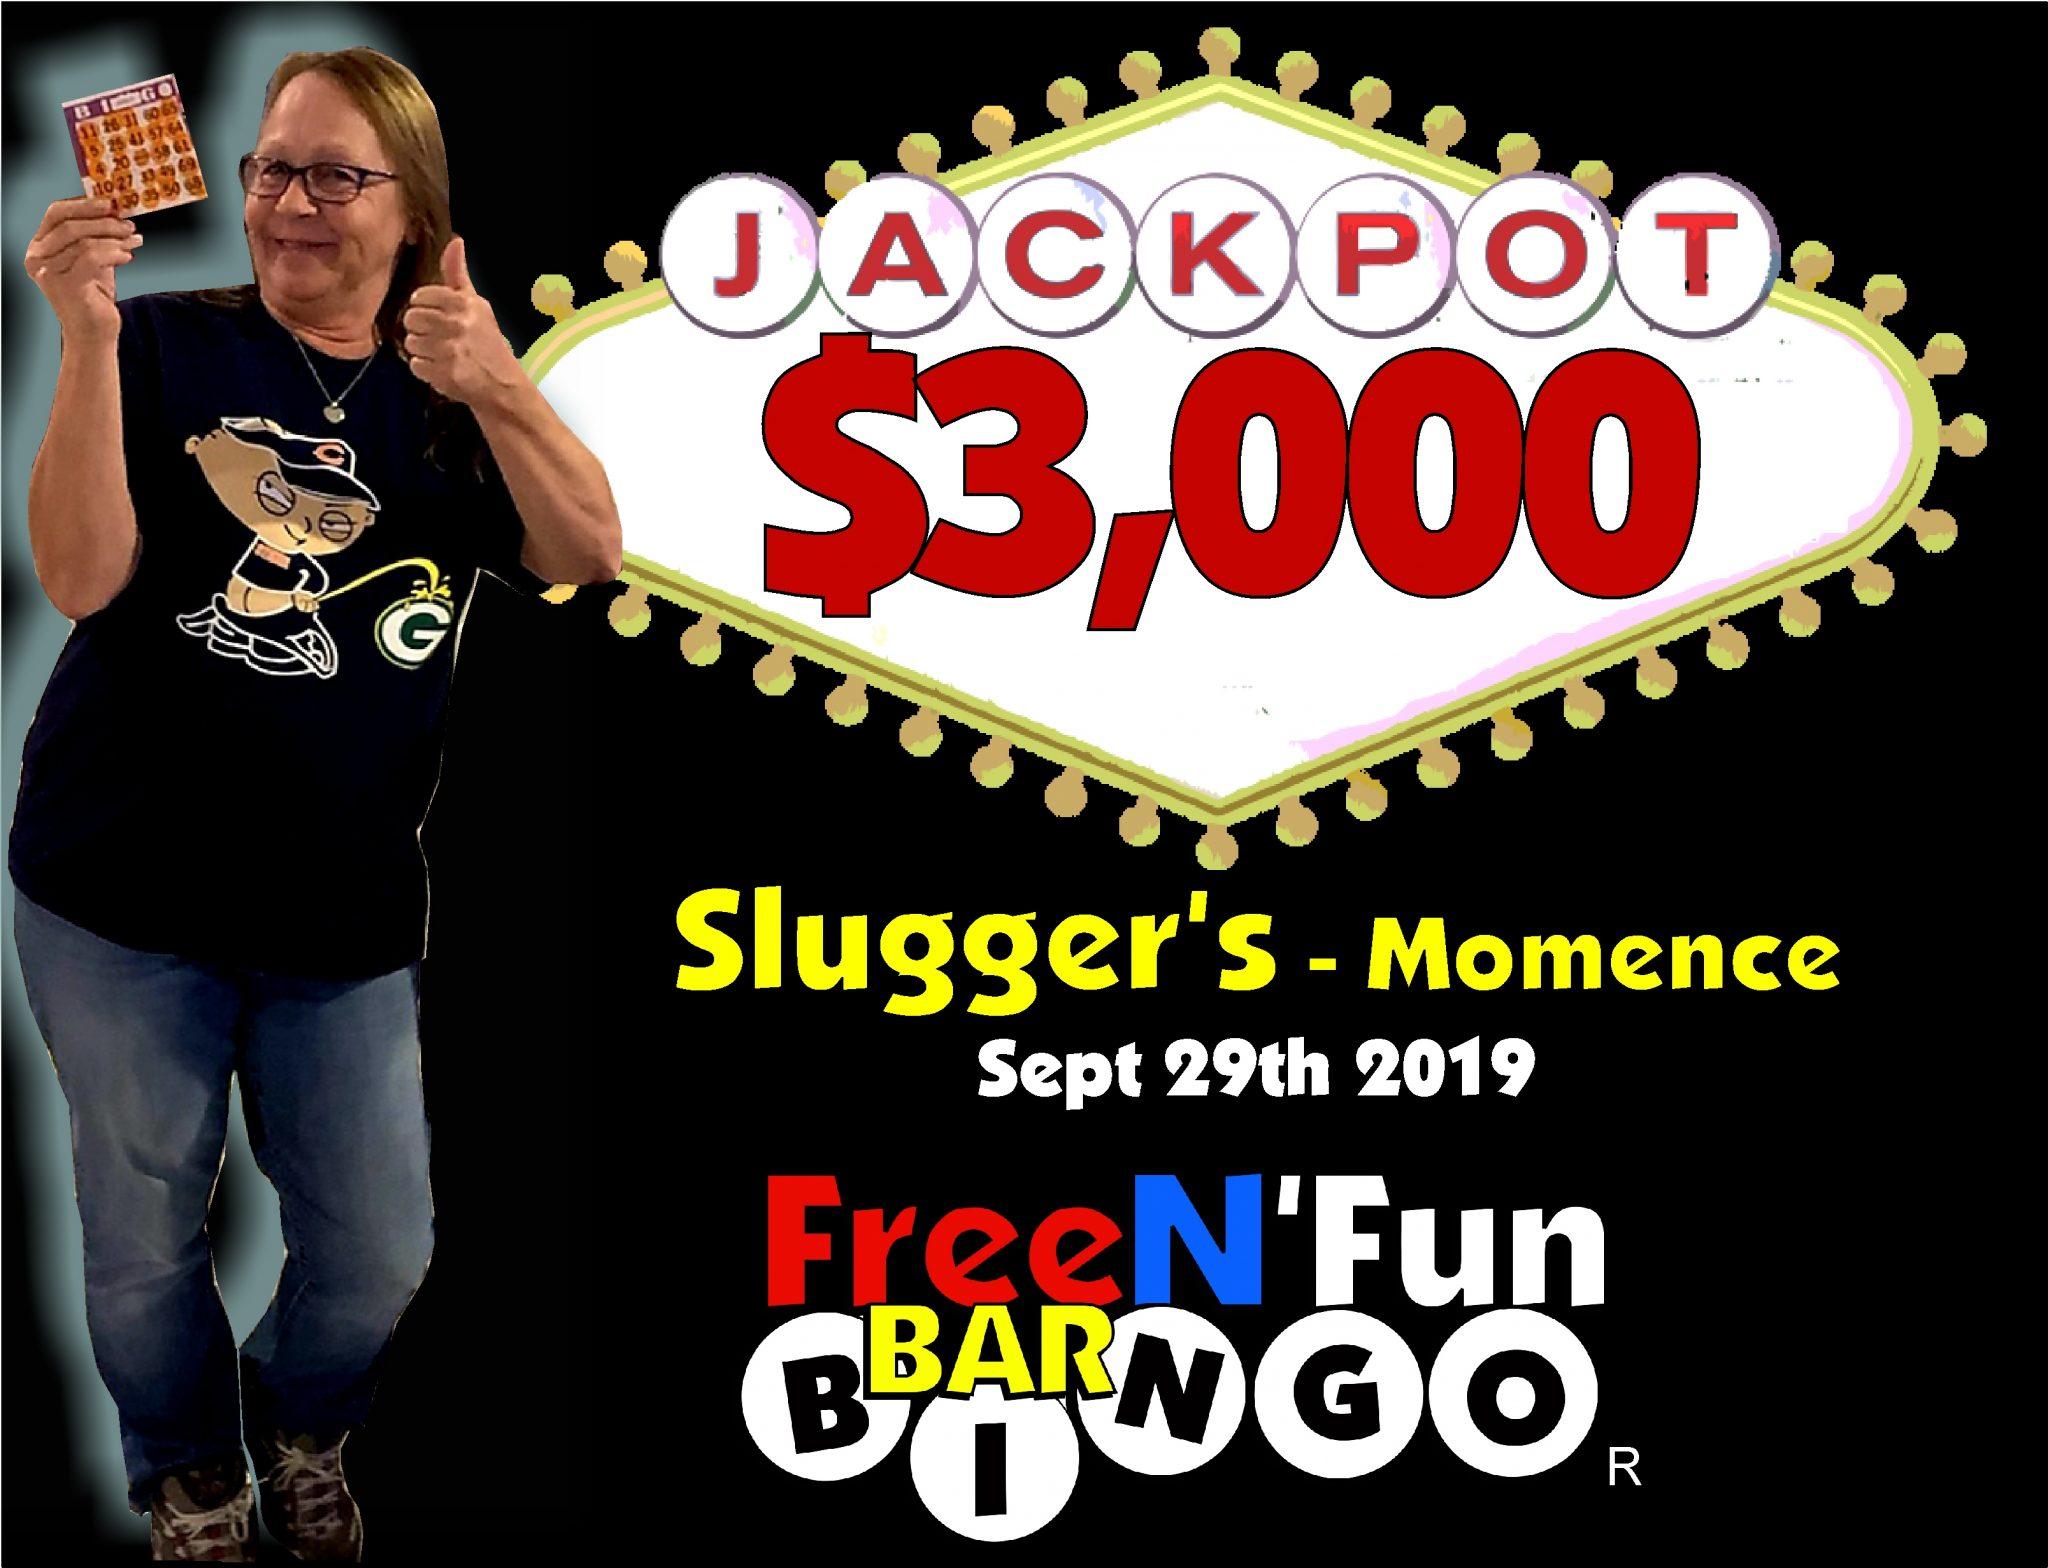 Jackpot Winner 2019 Deborah